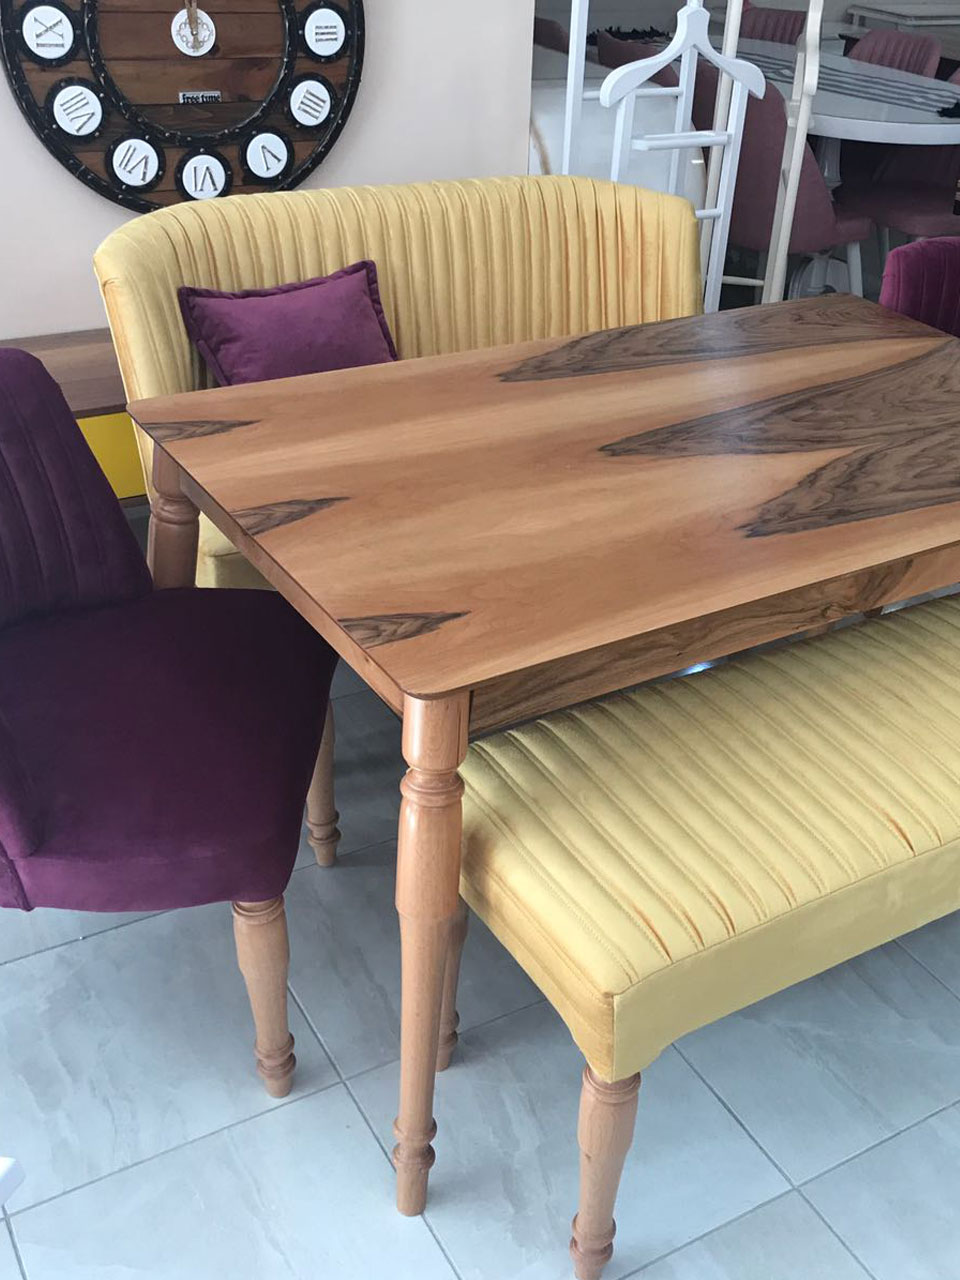 Mutfak masalari deal aksesuar for Ideal mobilya corbeil